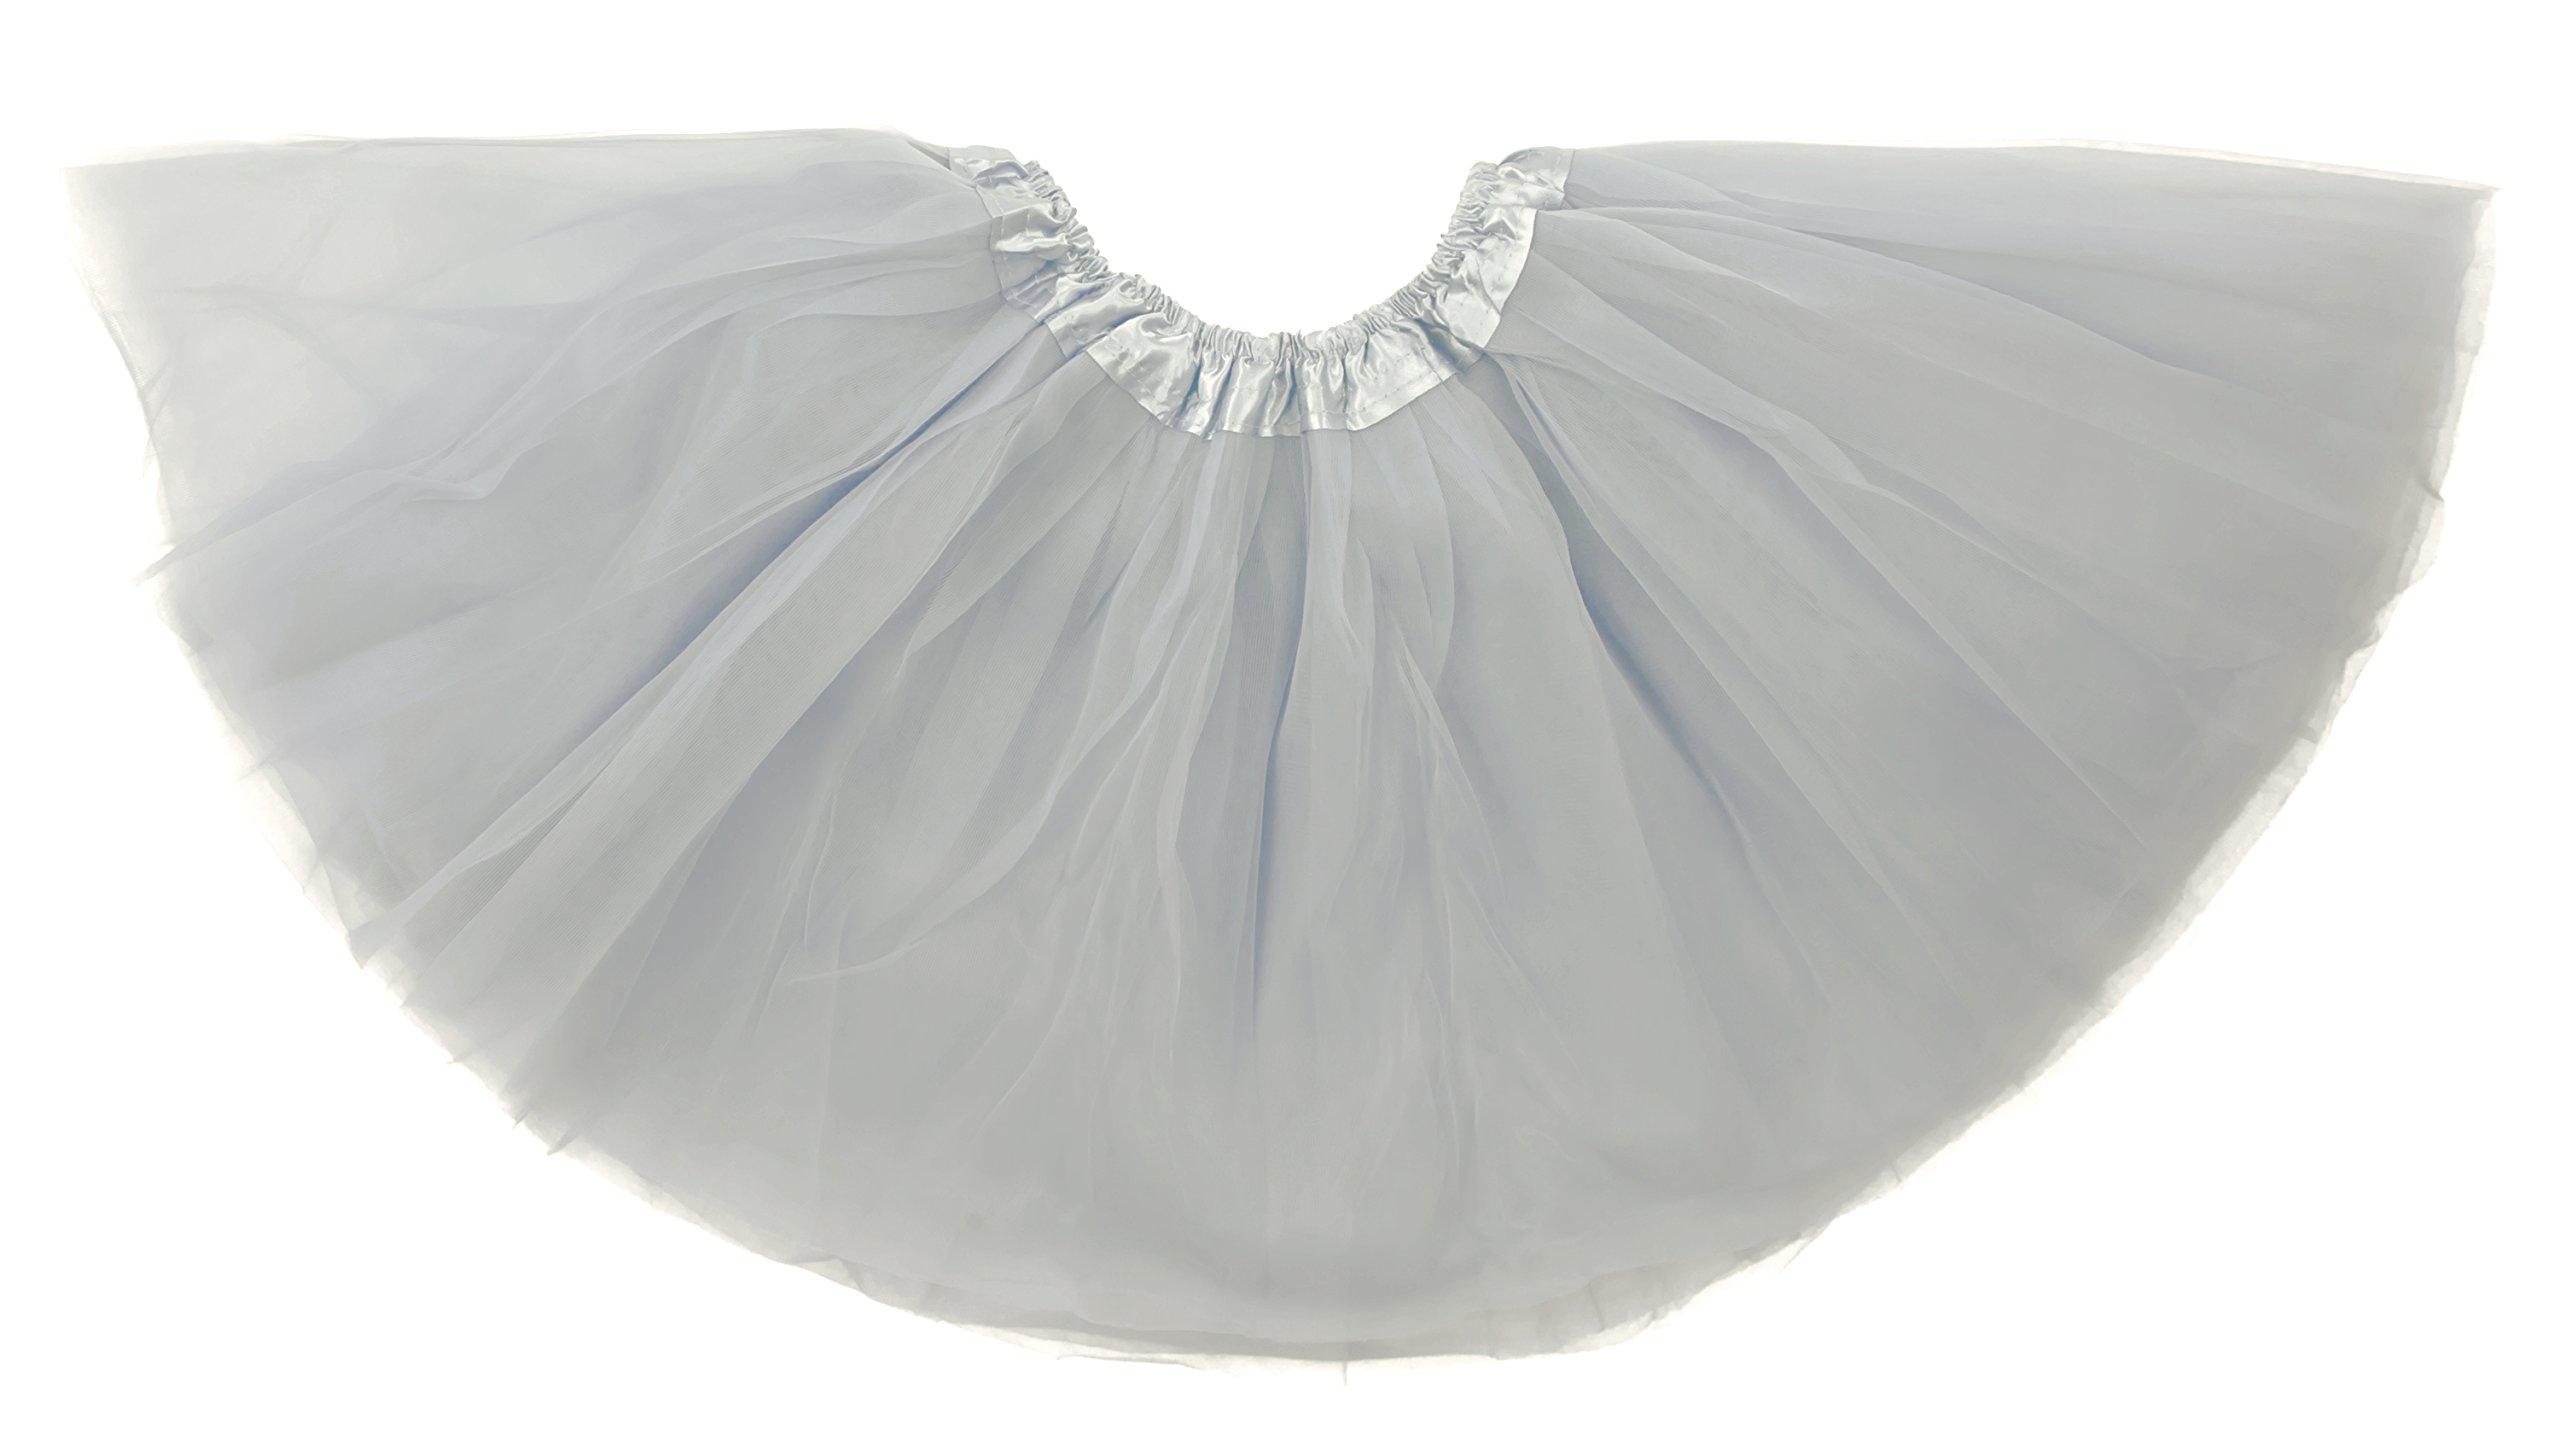 Dancina Tutu Tweens 5k 10k Fun Dash Run Classic Vintage 3 Layer Puffy Tulle Skirt 8-13 Years Grey